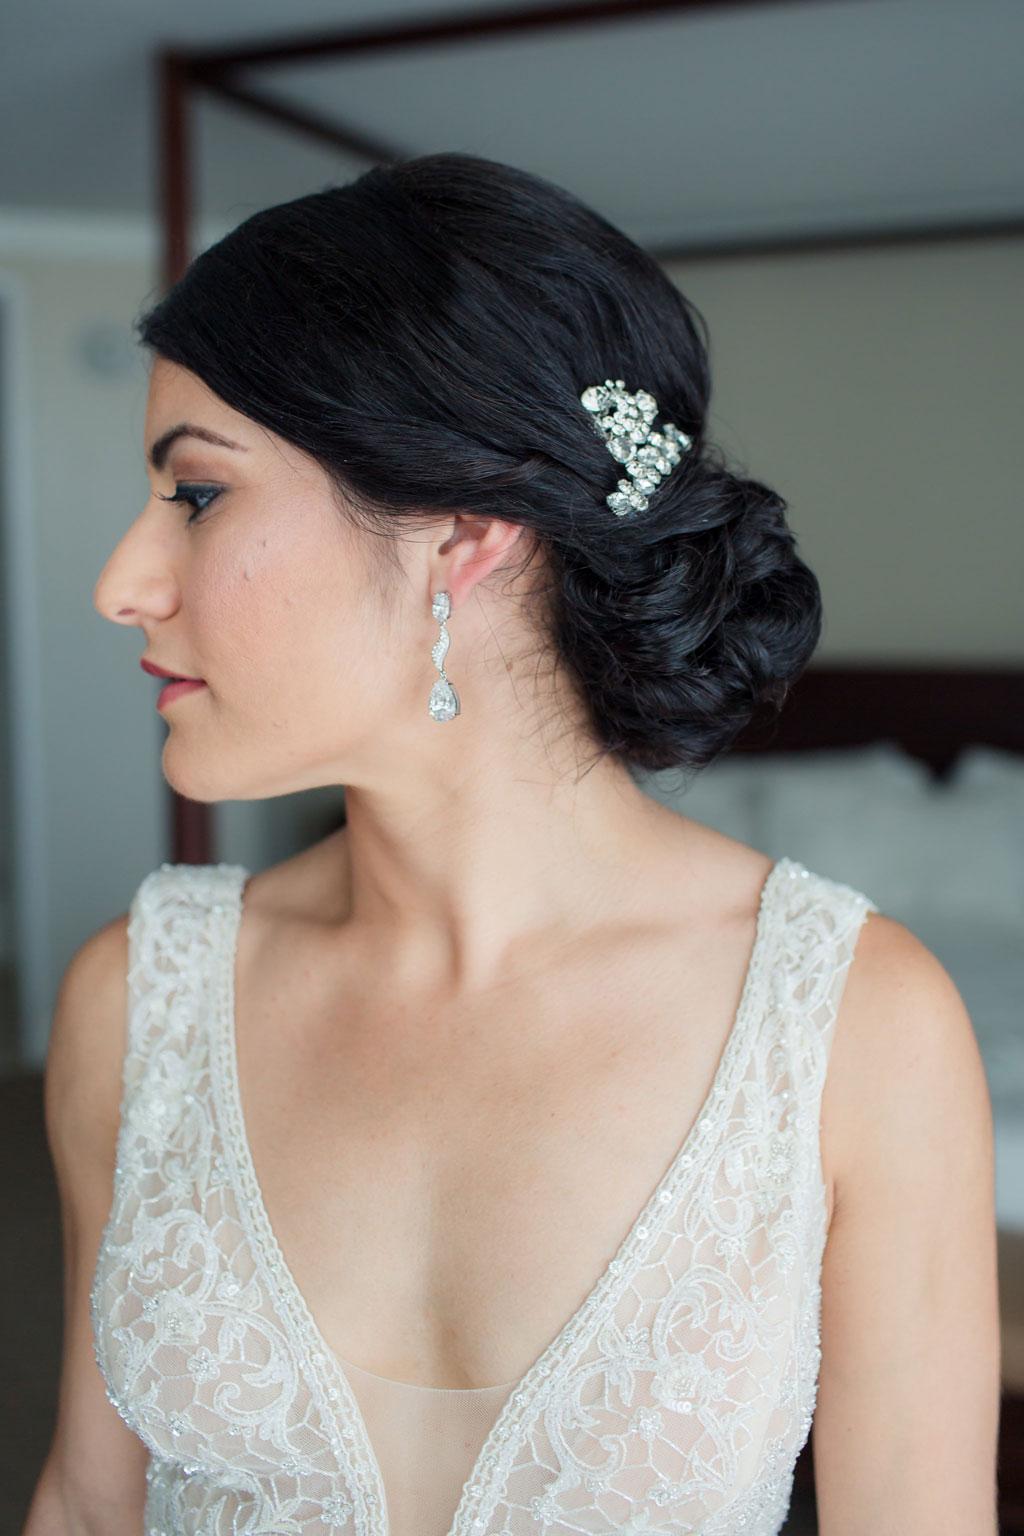 Island wedding hairstyles